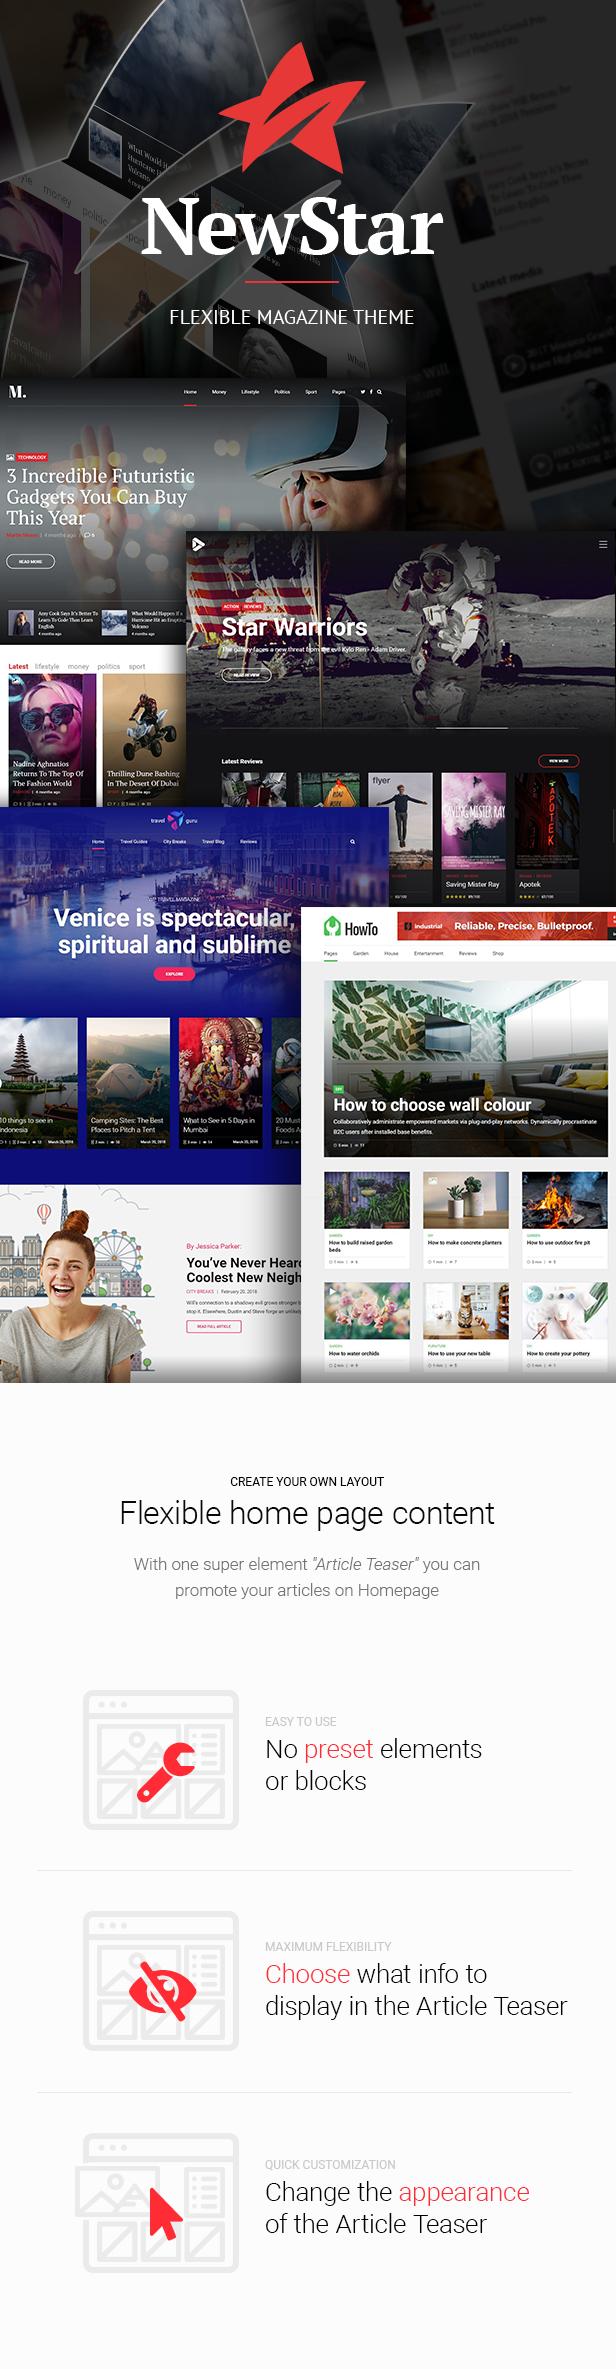 NewStar - Magazine & News WordPress Theme - 1